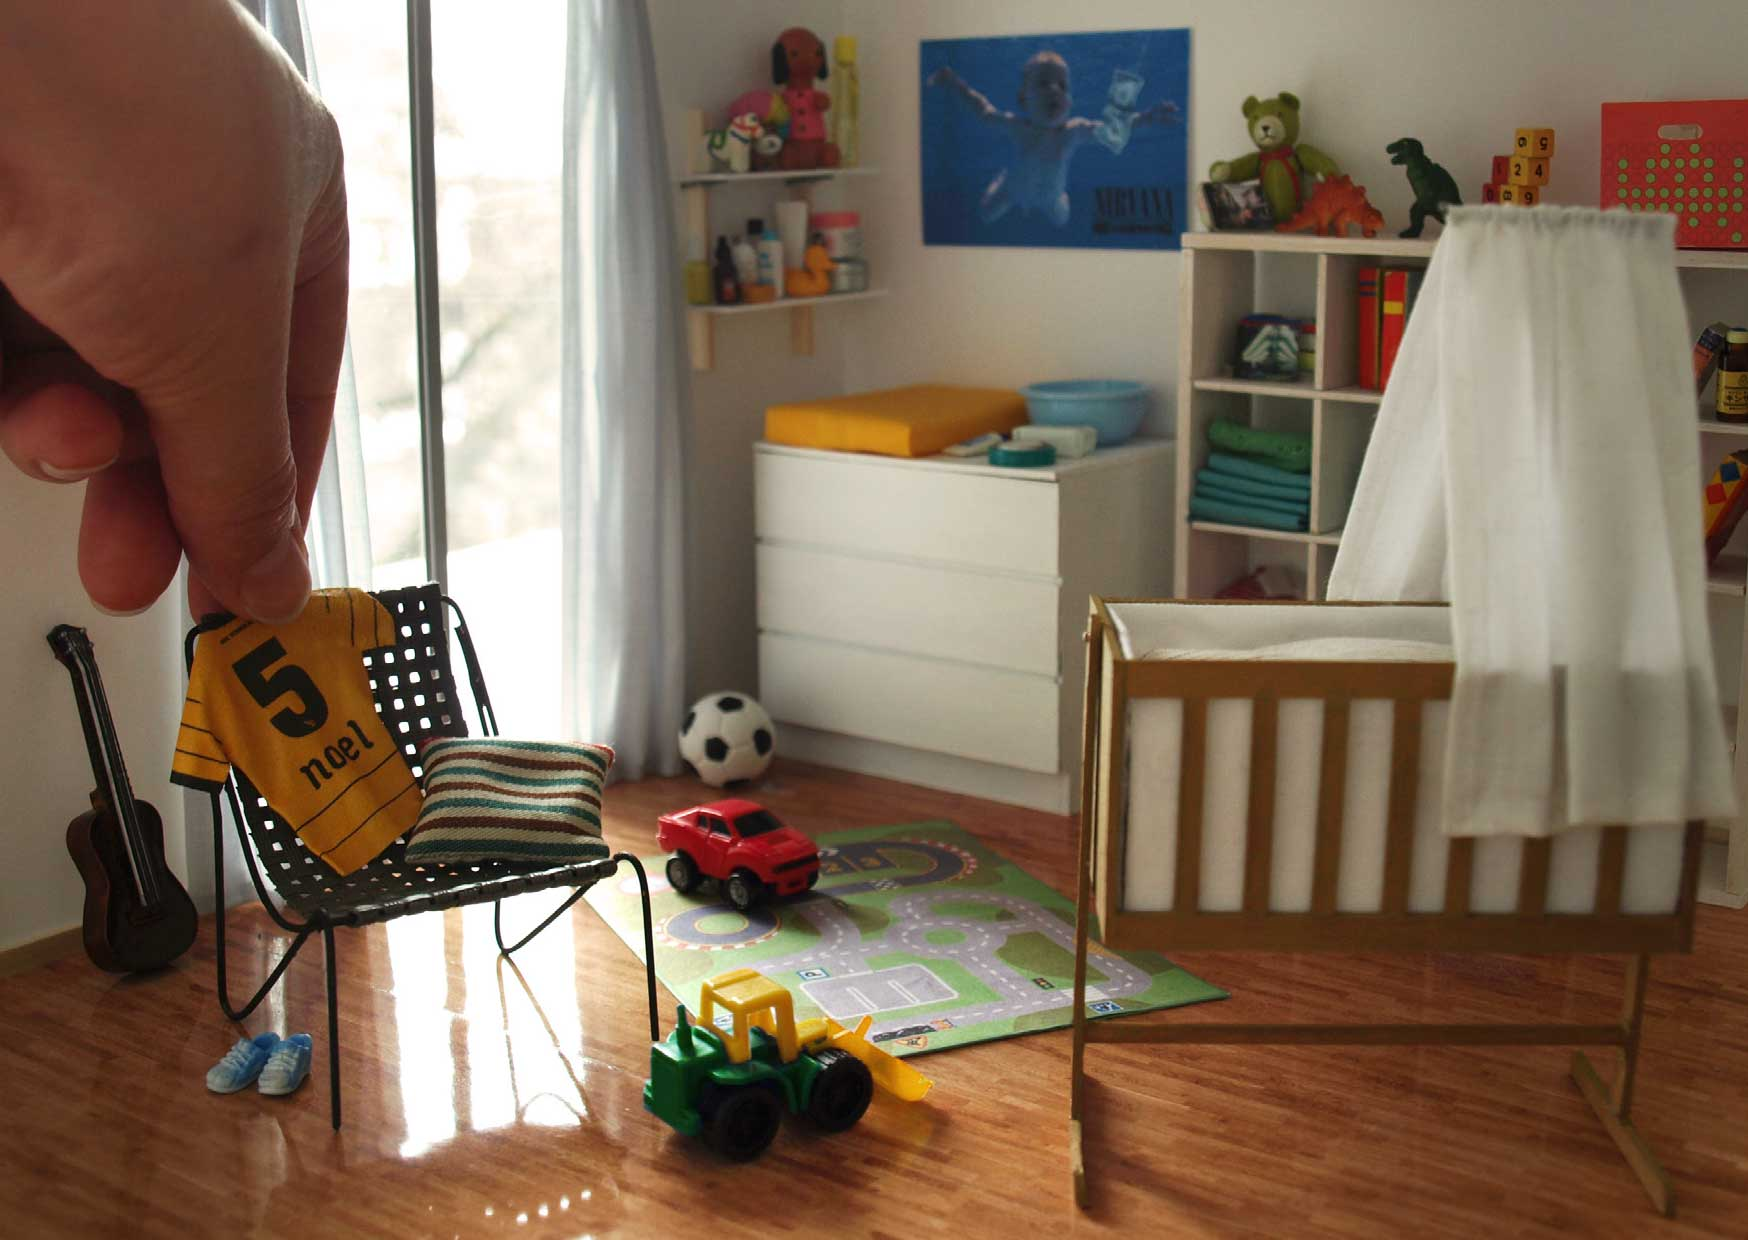 Miniature Scene by Annina Diston